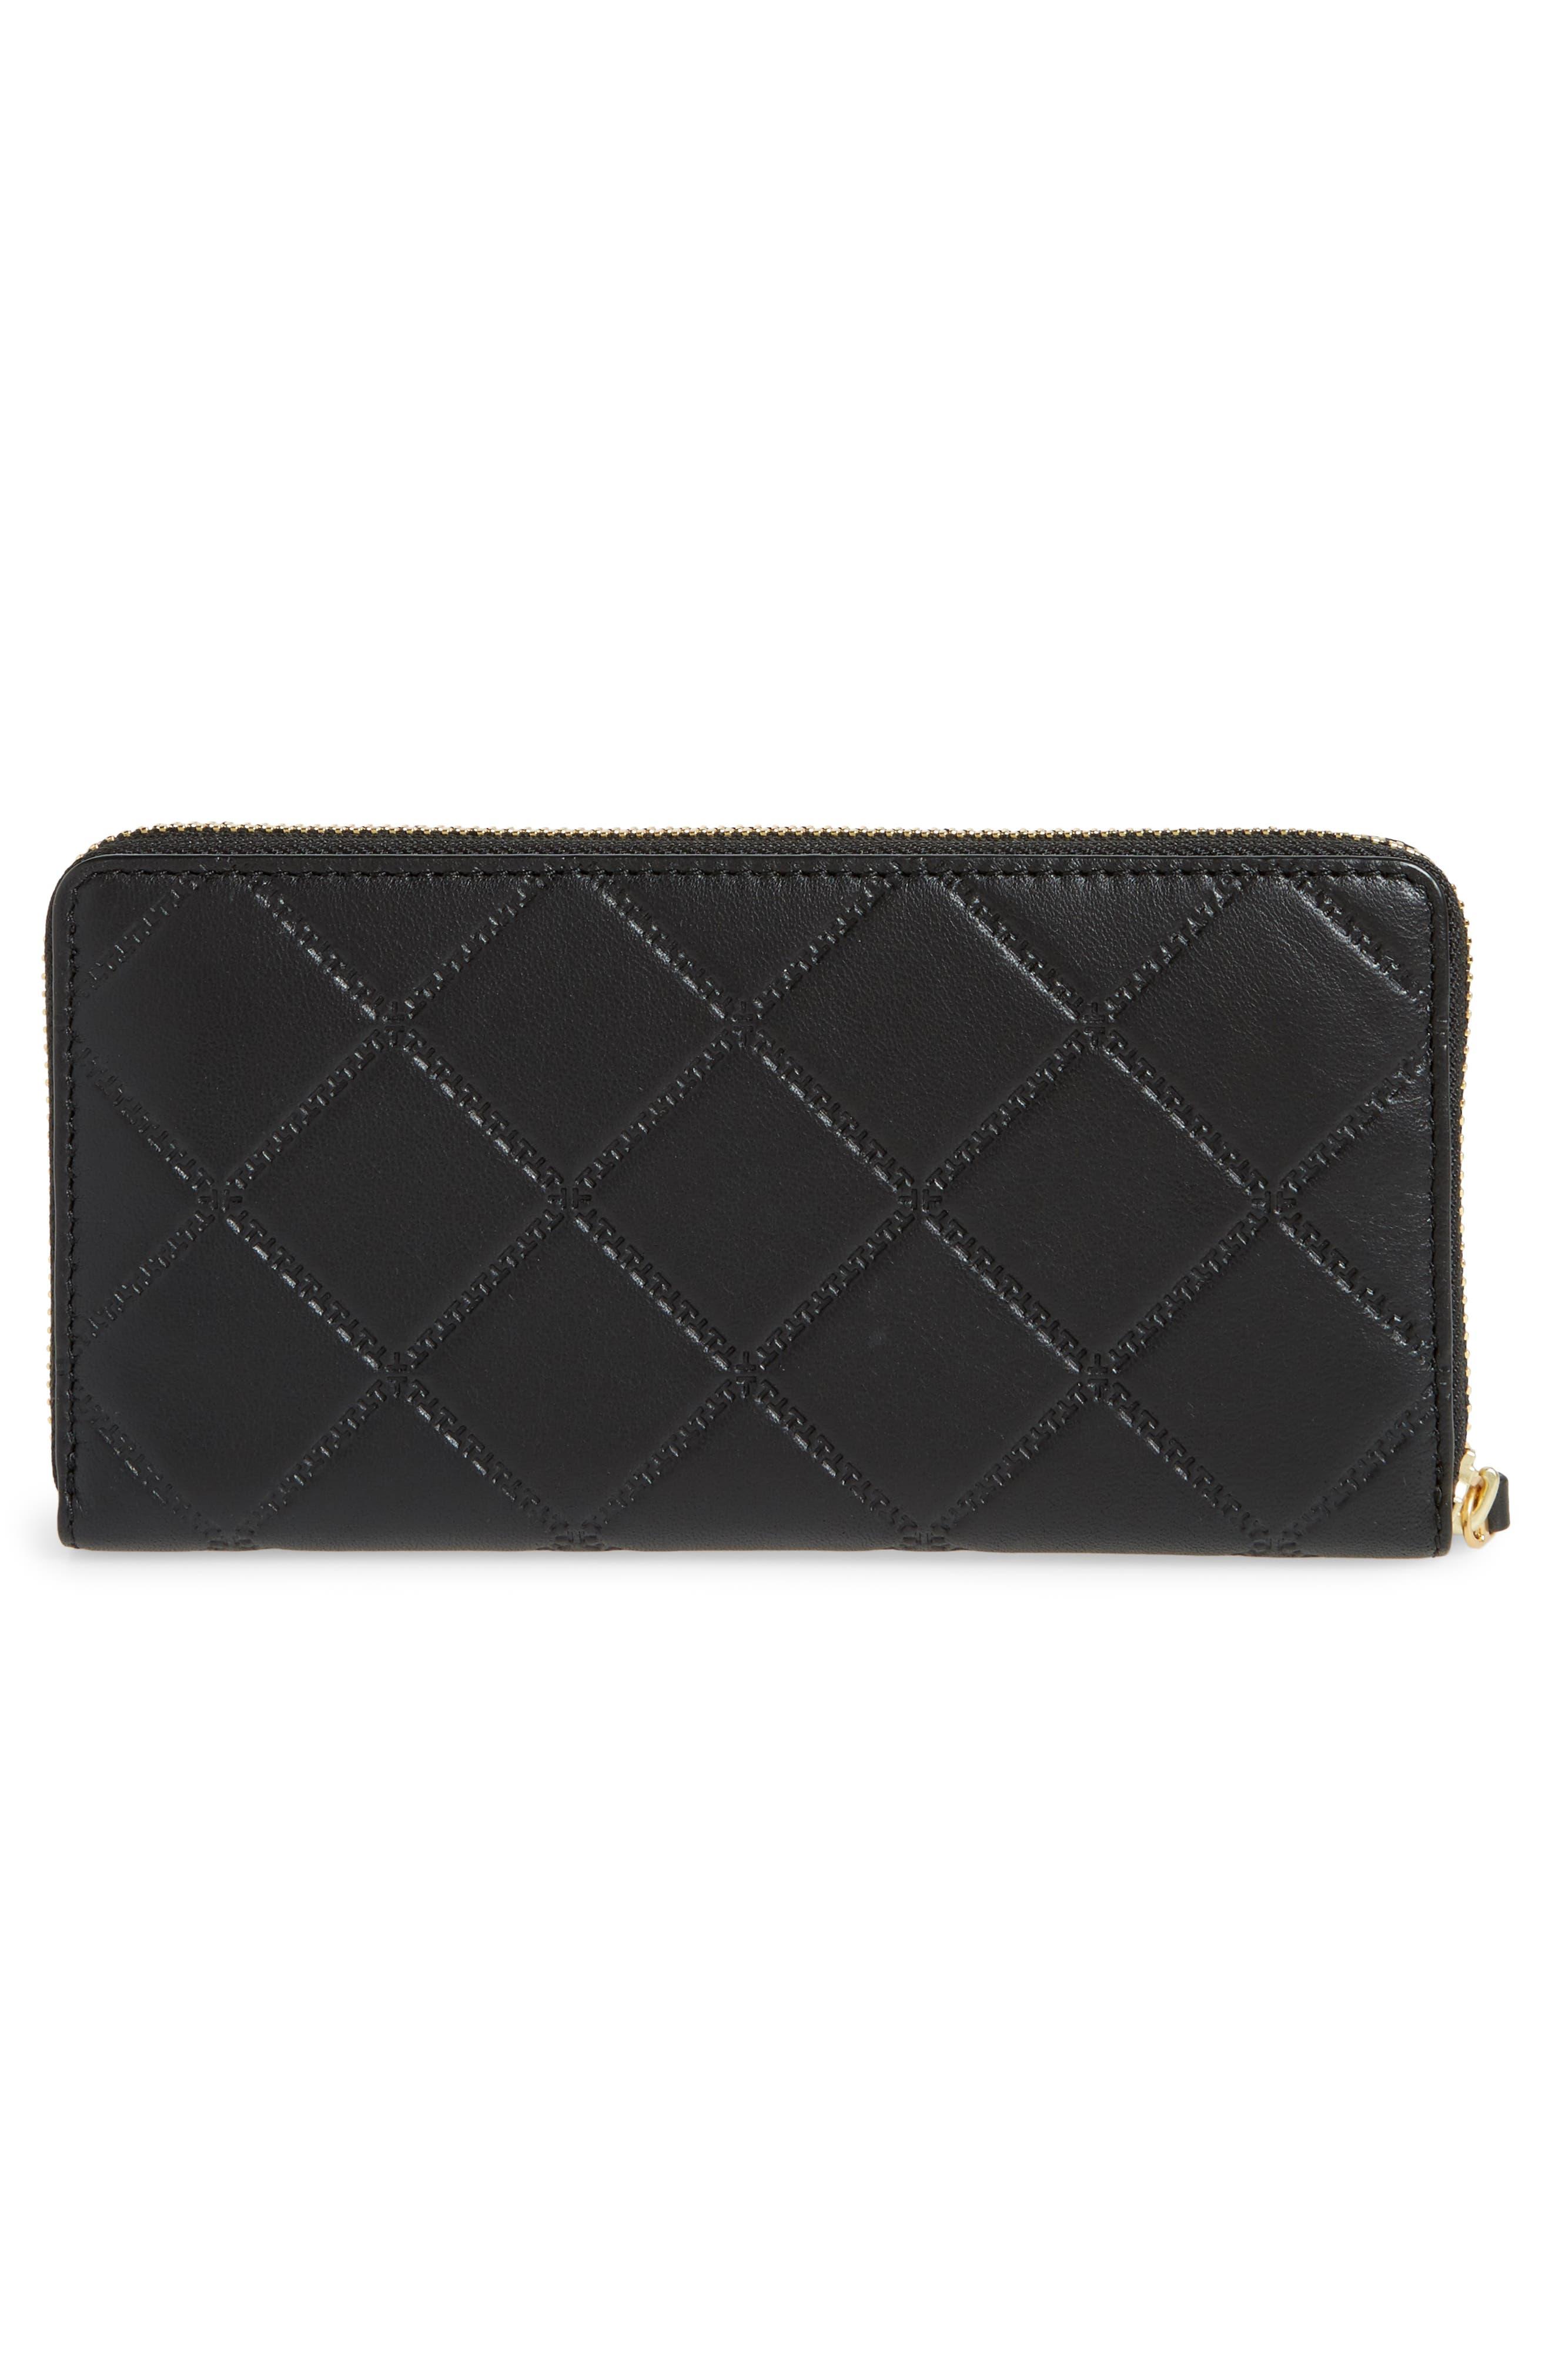 Georgia Zip Continental Wallet,                             Alternate thumbnail 4, color,                             Black